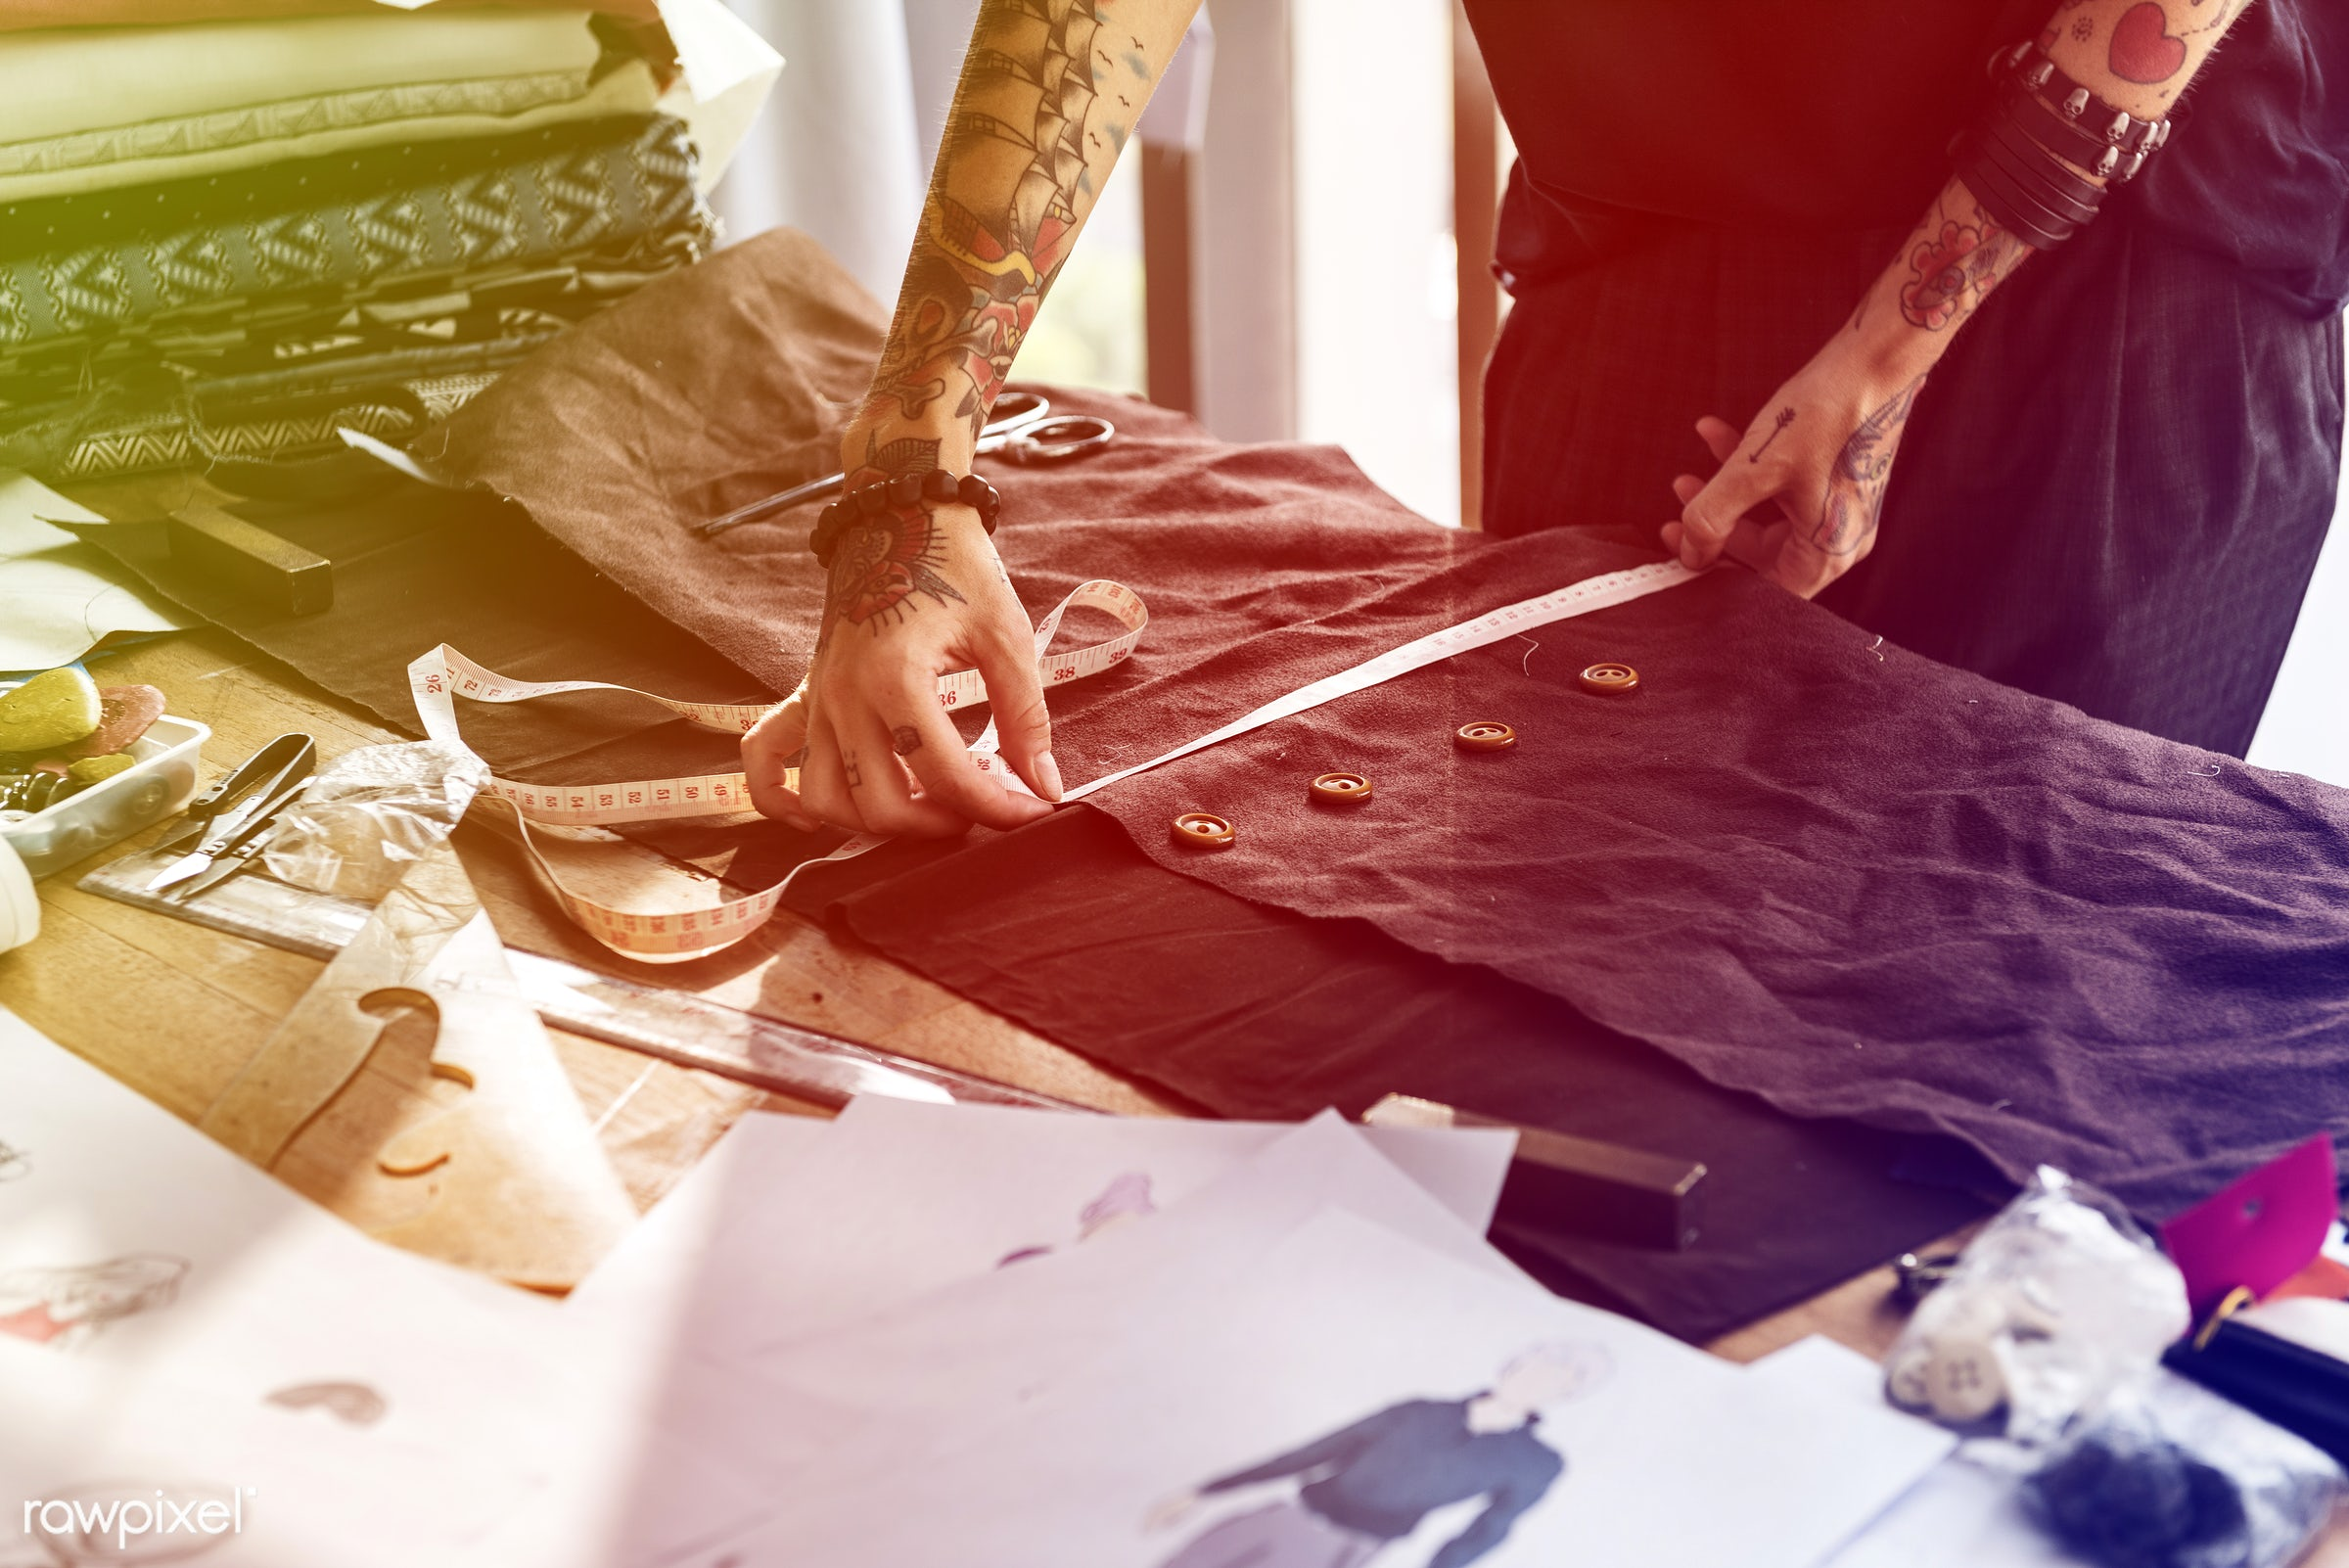 studio, store, handicraft, dressmaker, faded, yellow, vibrant, tailor made, woman, blend, lifestyle, tattoo, light, orange,...